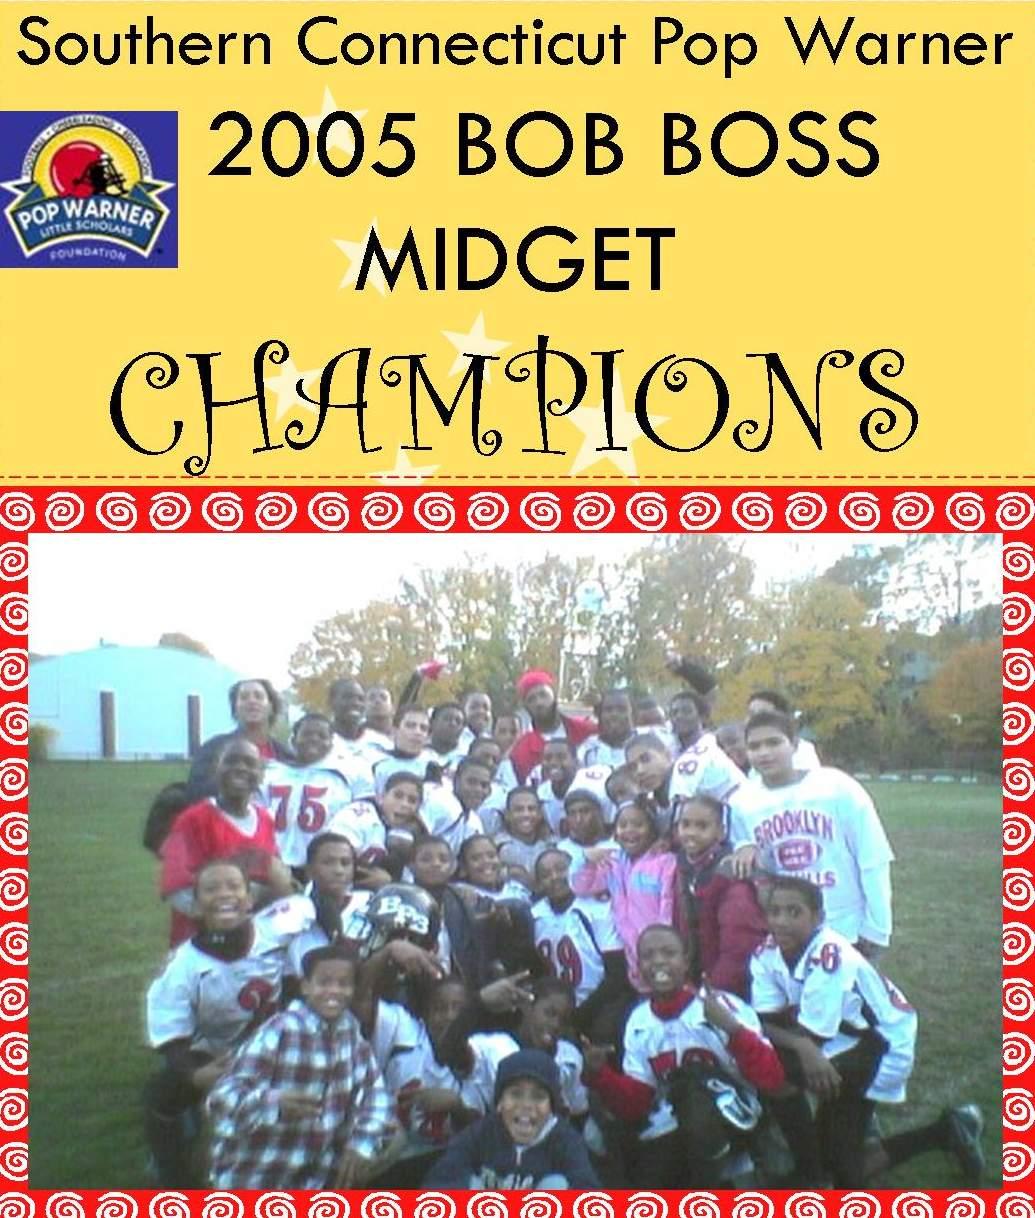 2005 Bob Boss Midget Champions